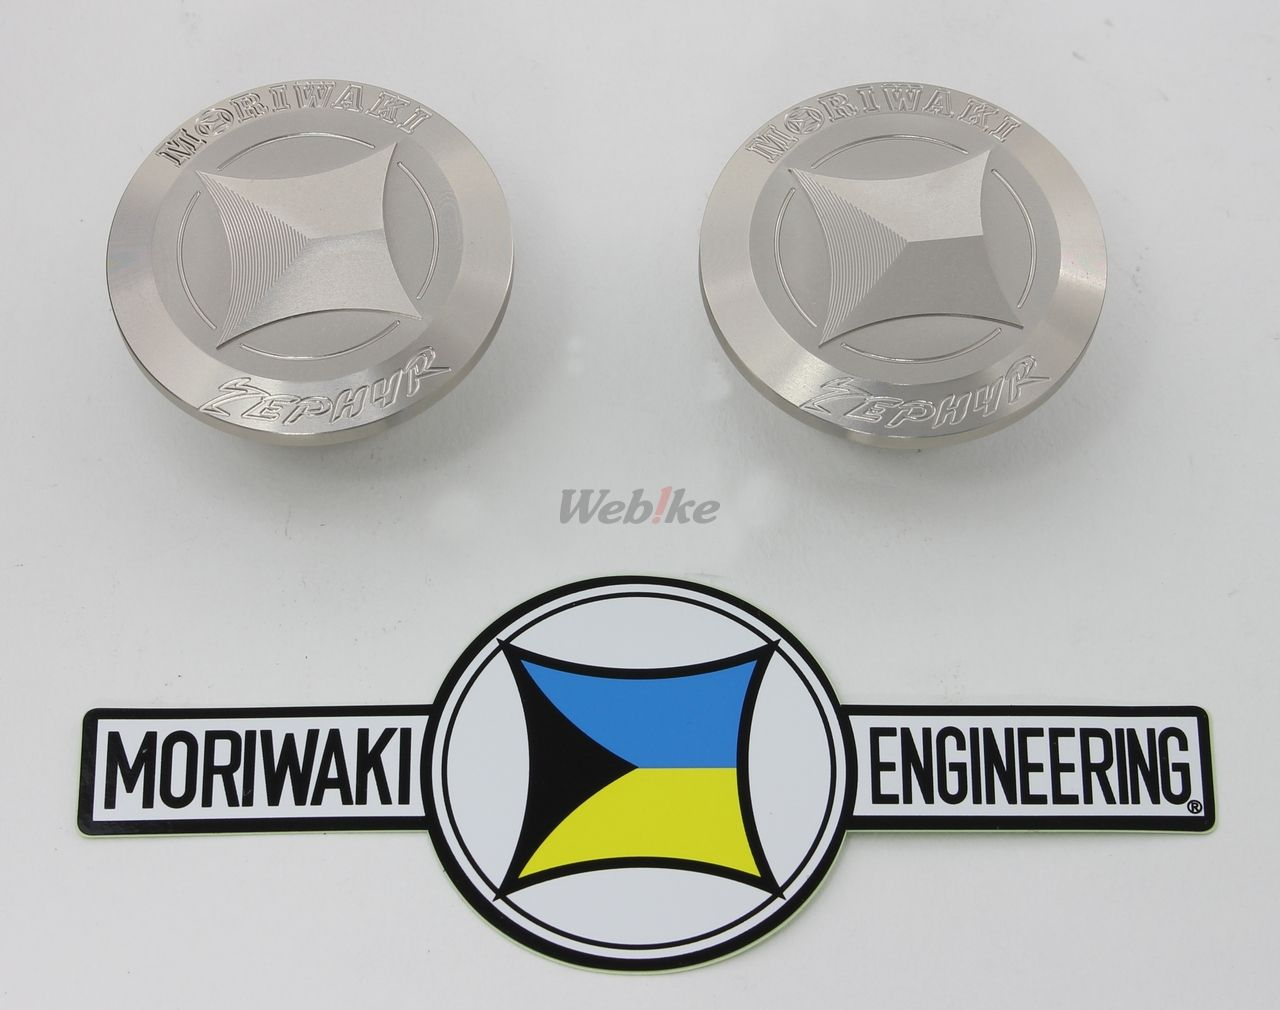 【MORIWAKI】車架裝飾蓋 - 「Webike-摩托百貨」